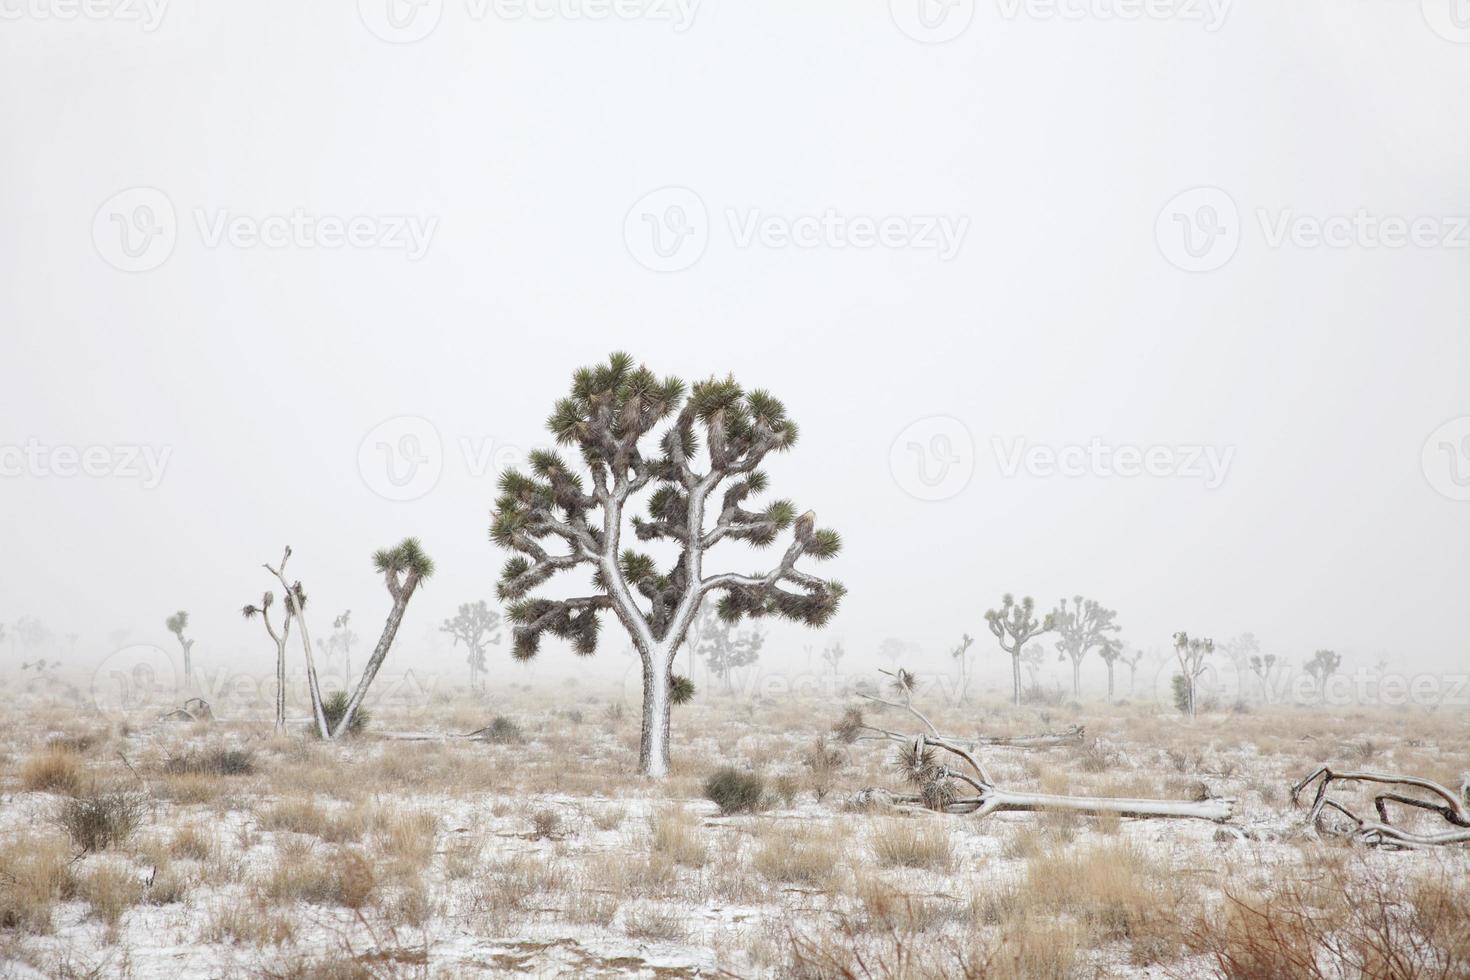 Mojave Desert Blizzard Joshua Tree National Park California copy space photo